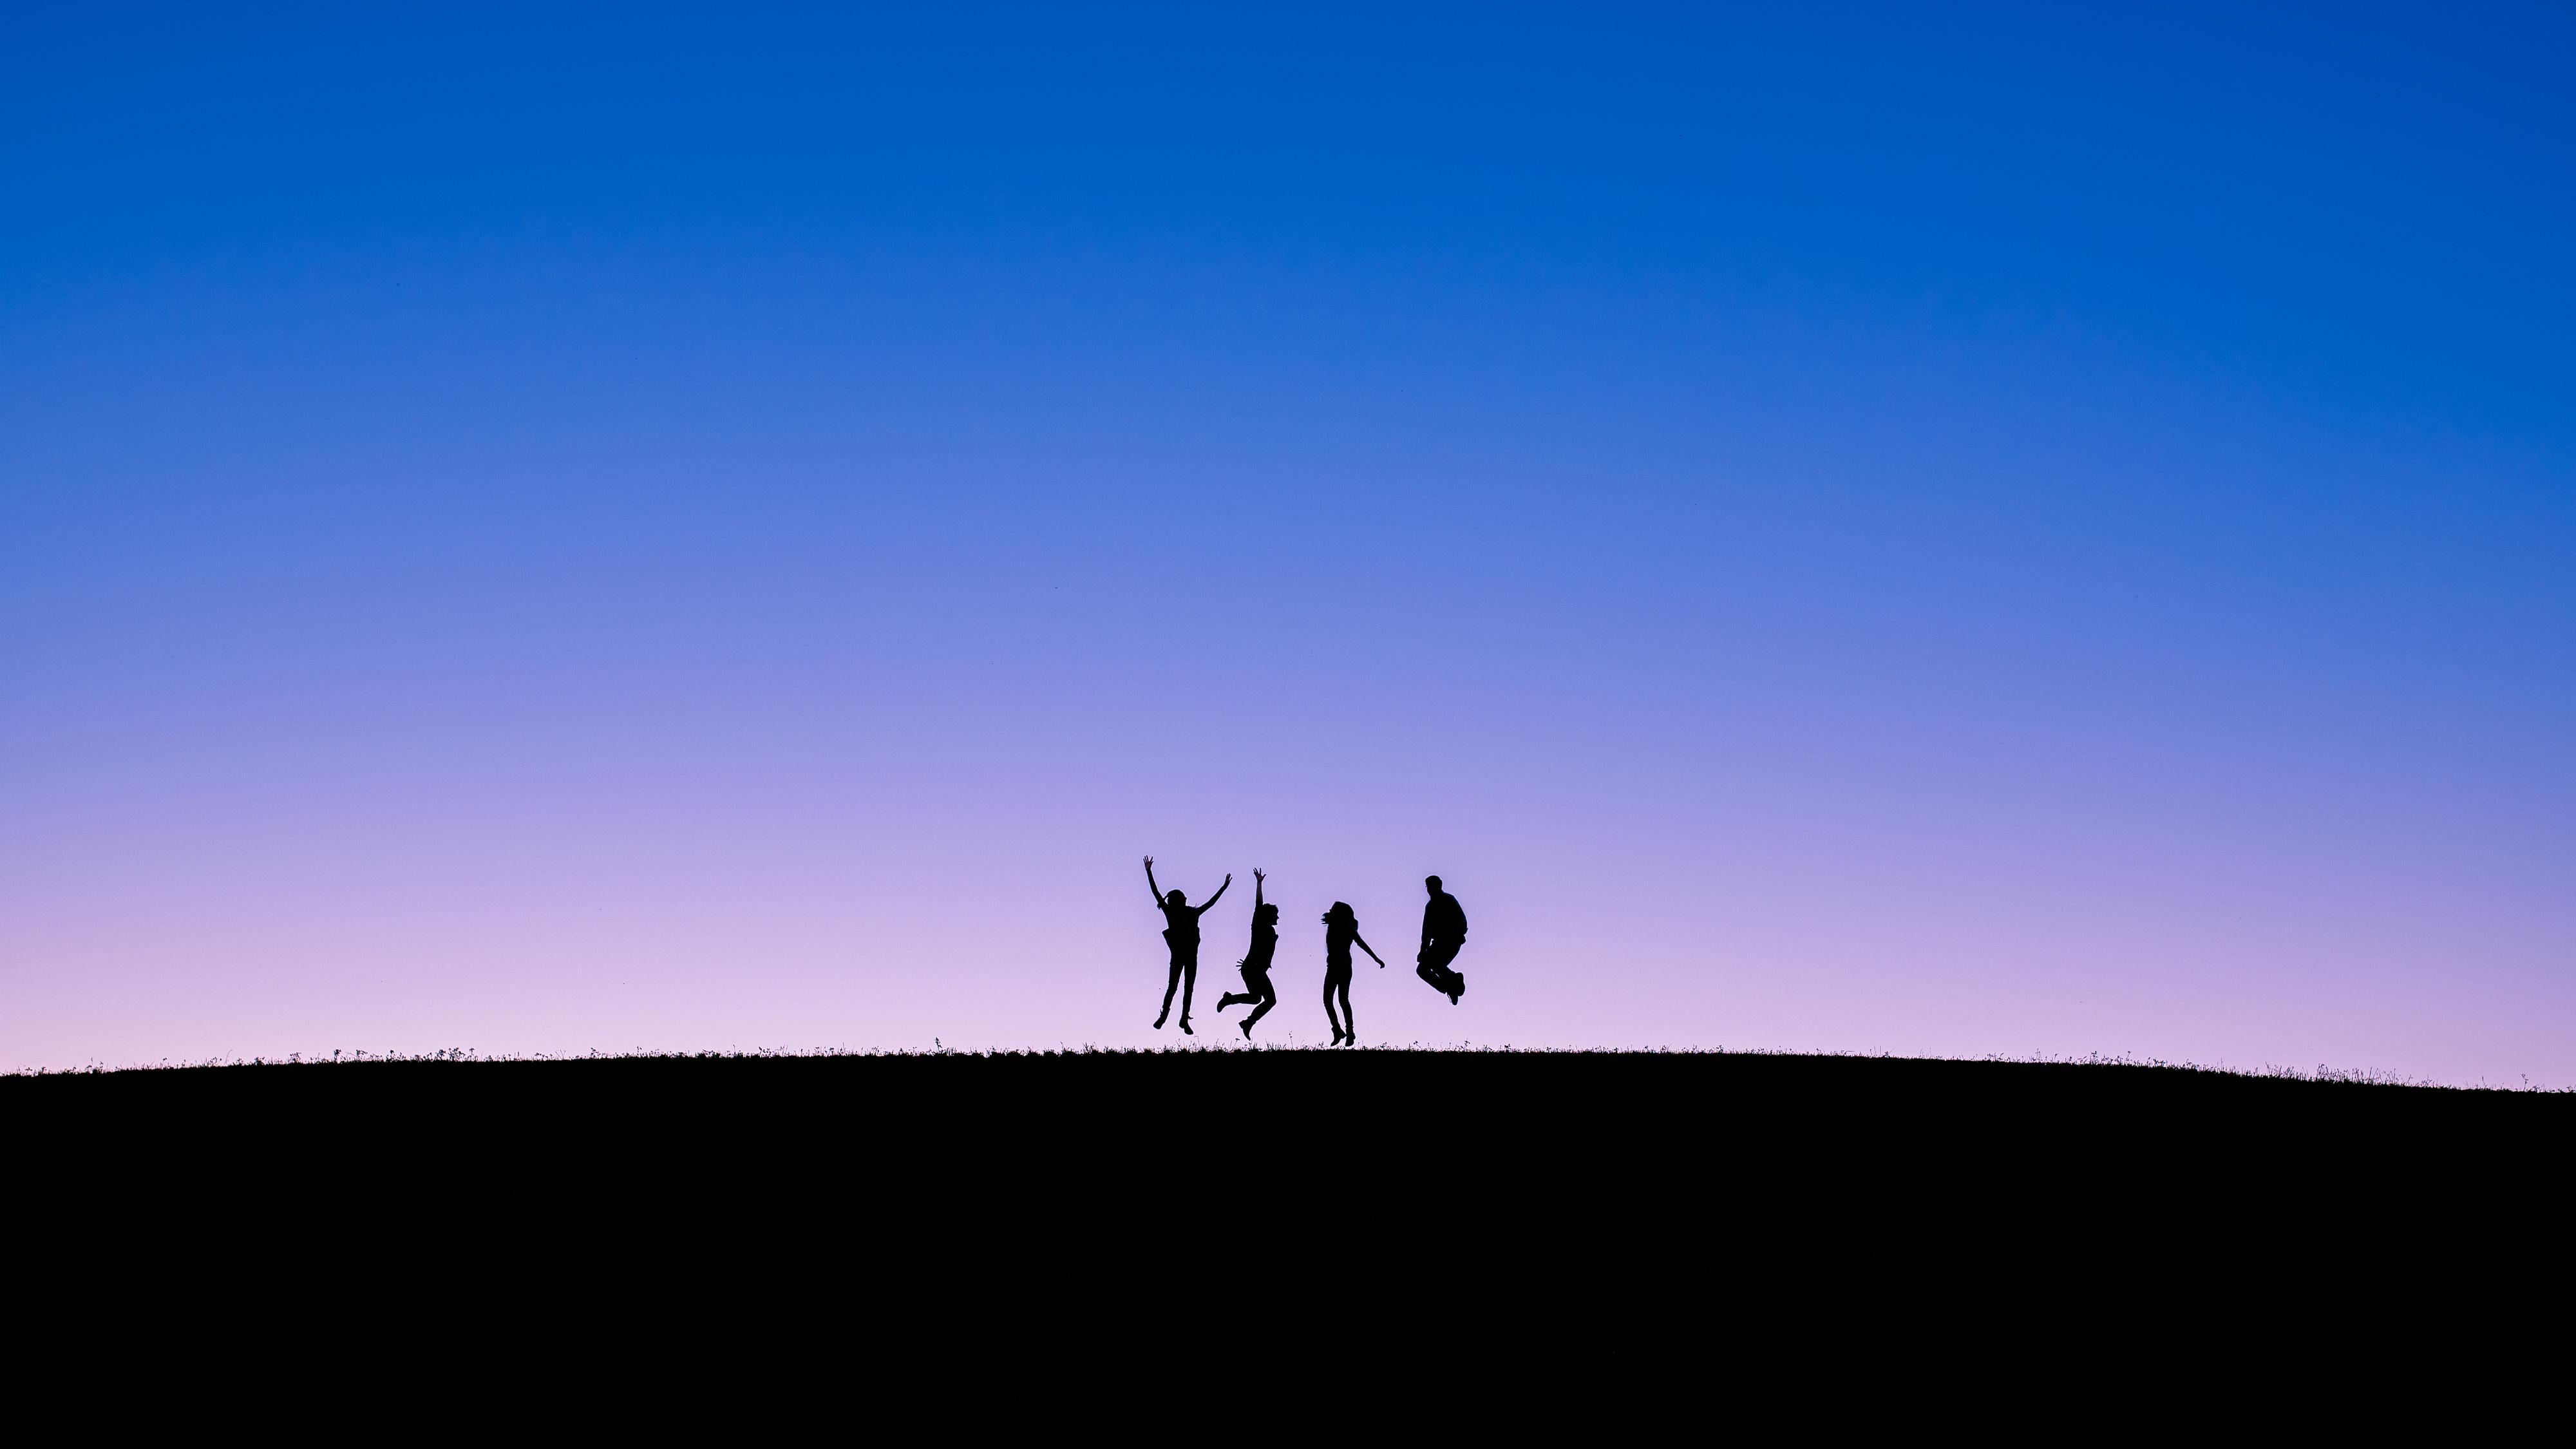 Minimalist silhouette family photos